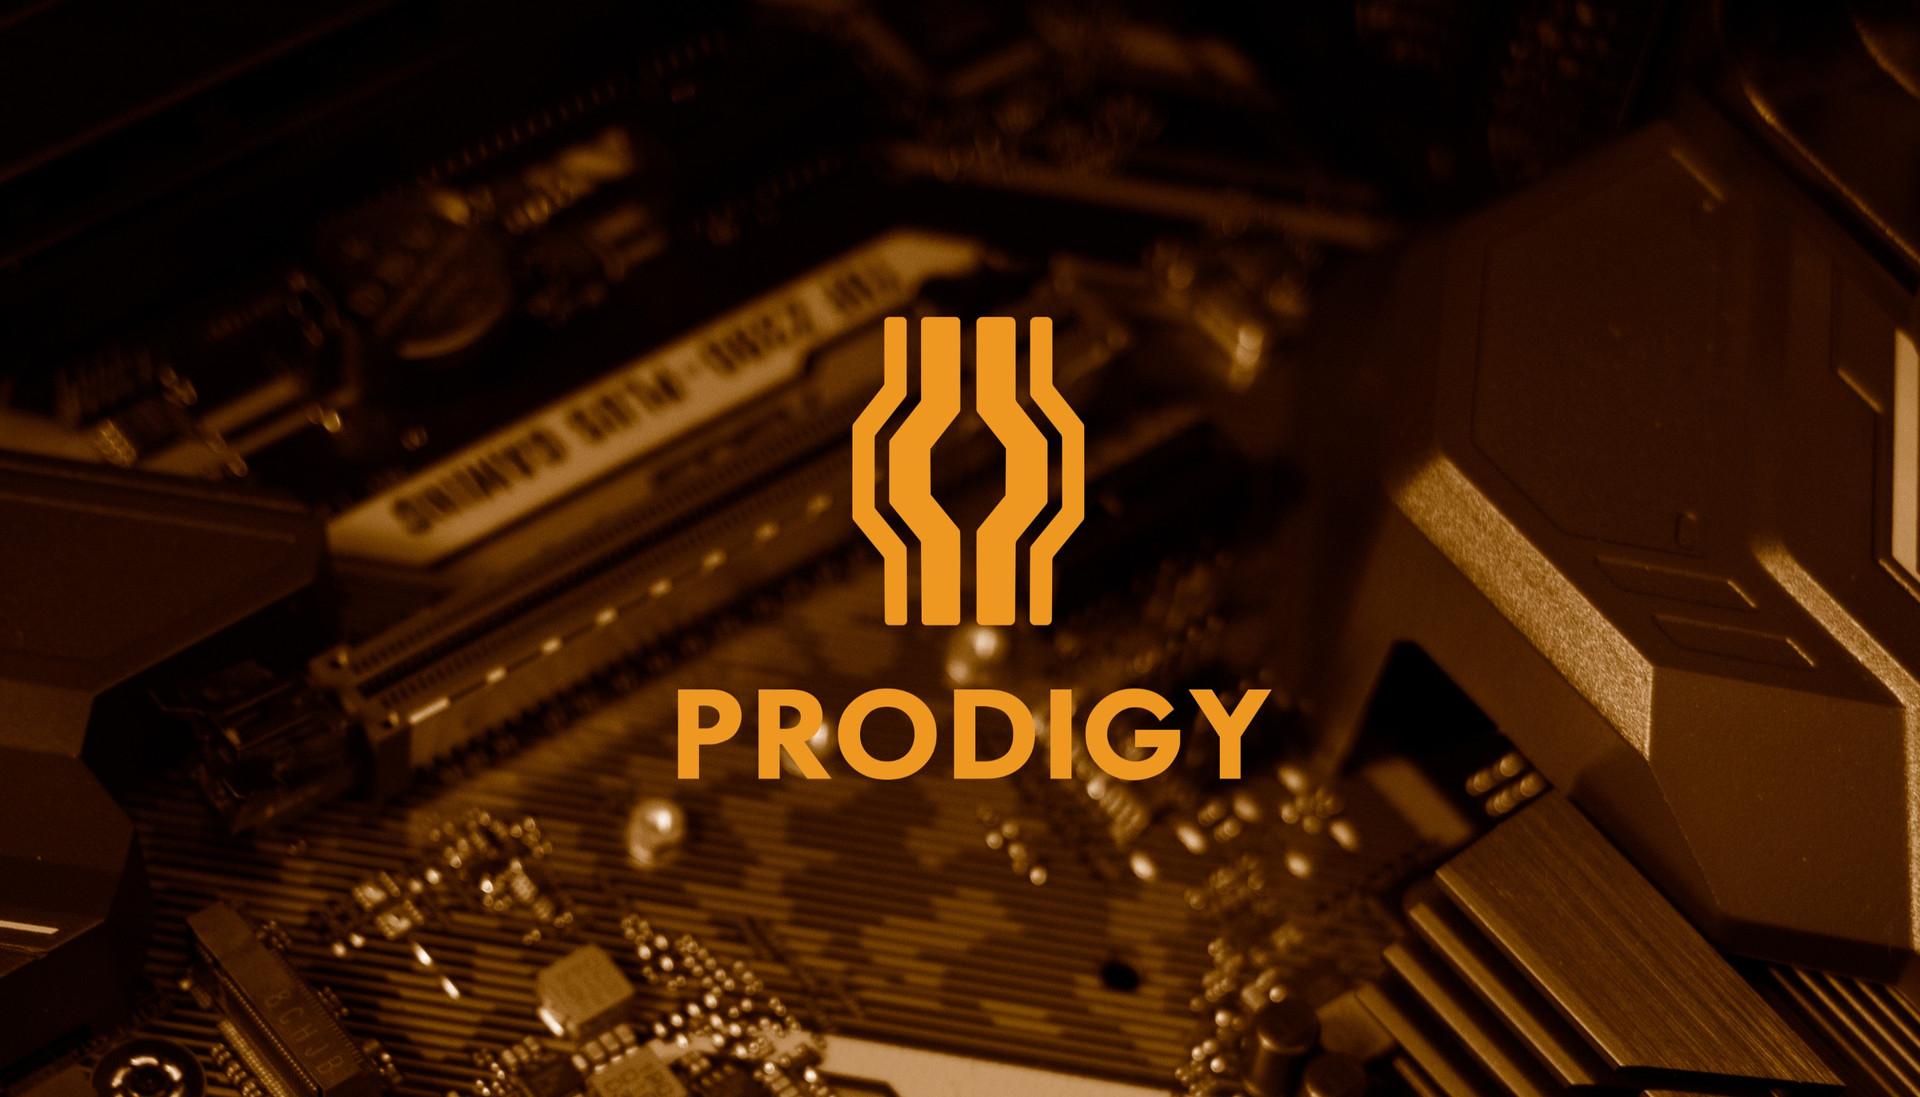 Prodigy%20logo%20background_edited.jpg